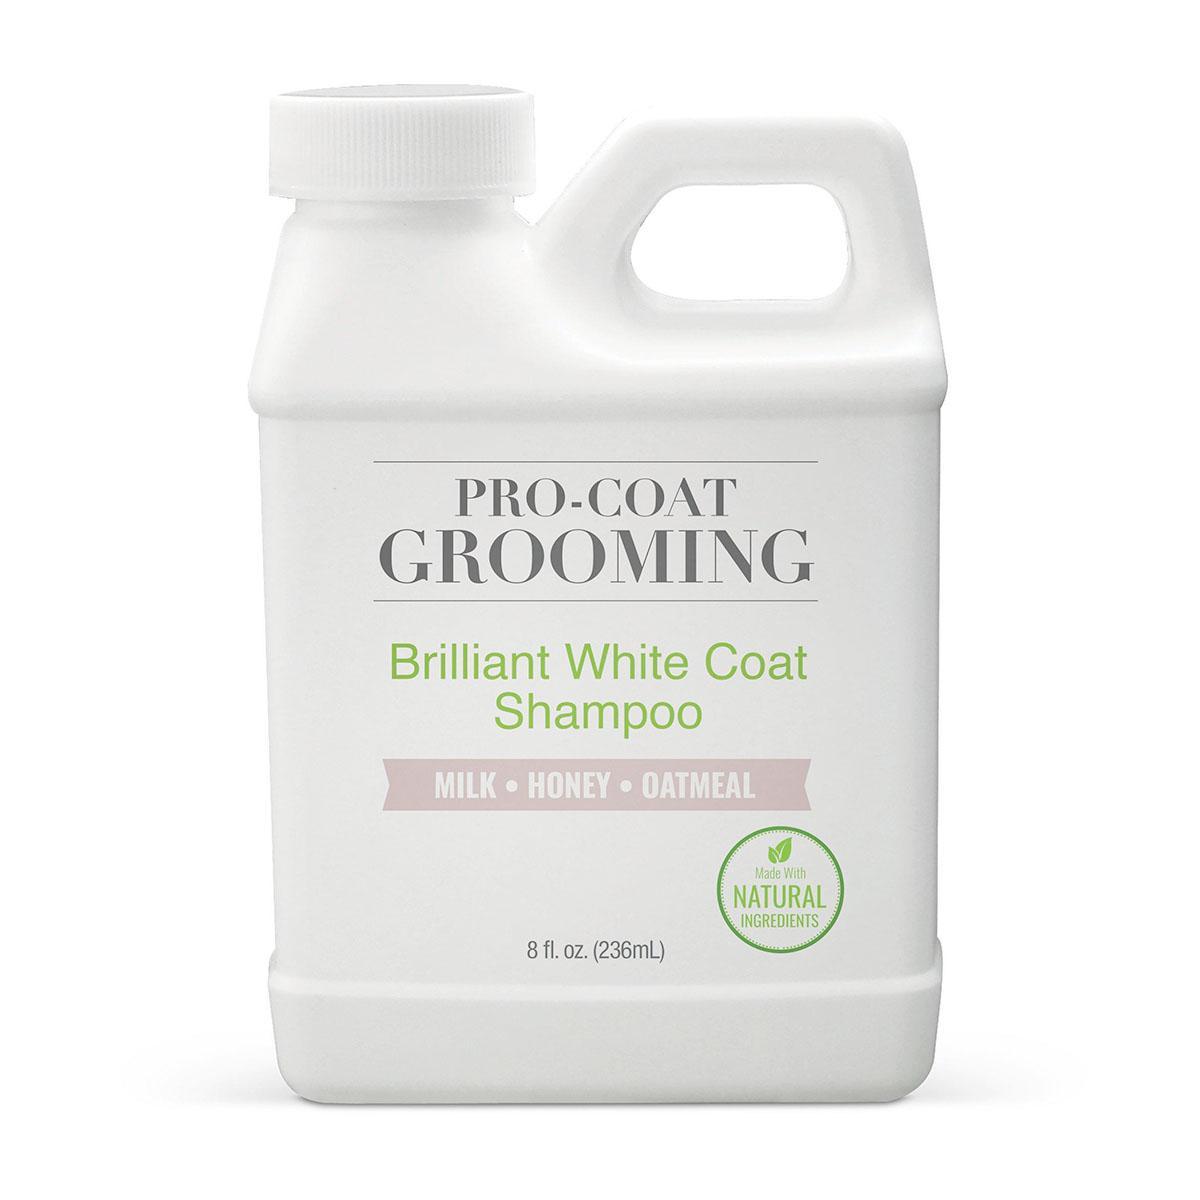 Pure and Natural Pet Pro-Coat Self-Wash Brilliant White Coat Dog Shampoo - Milk, Honey & Green Tea Extract